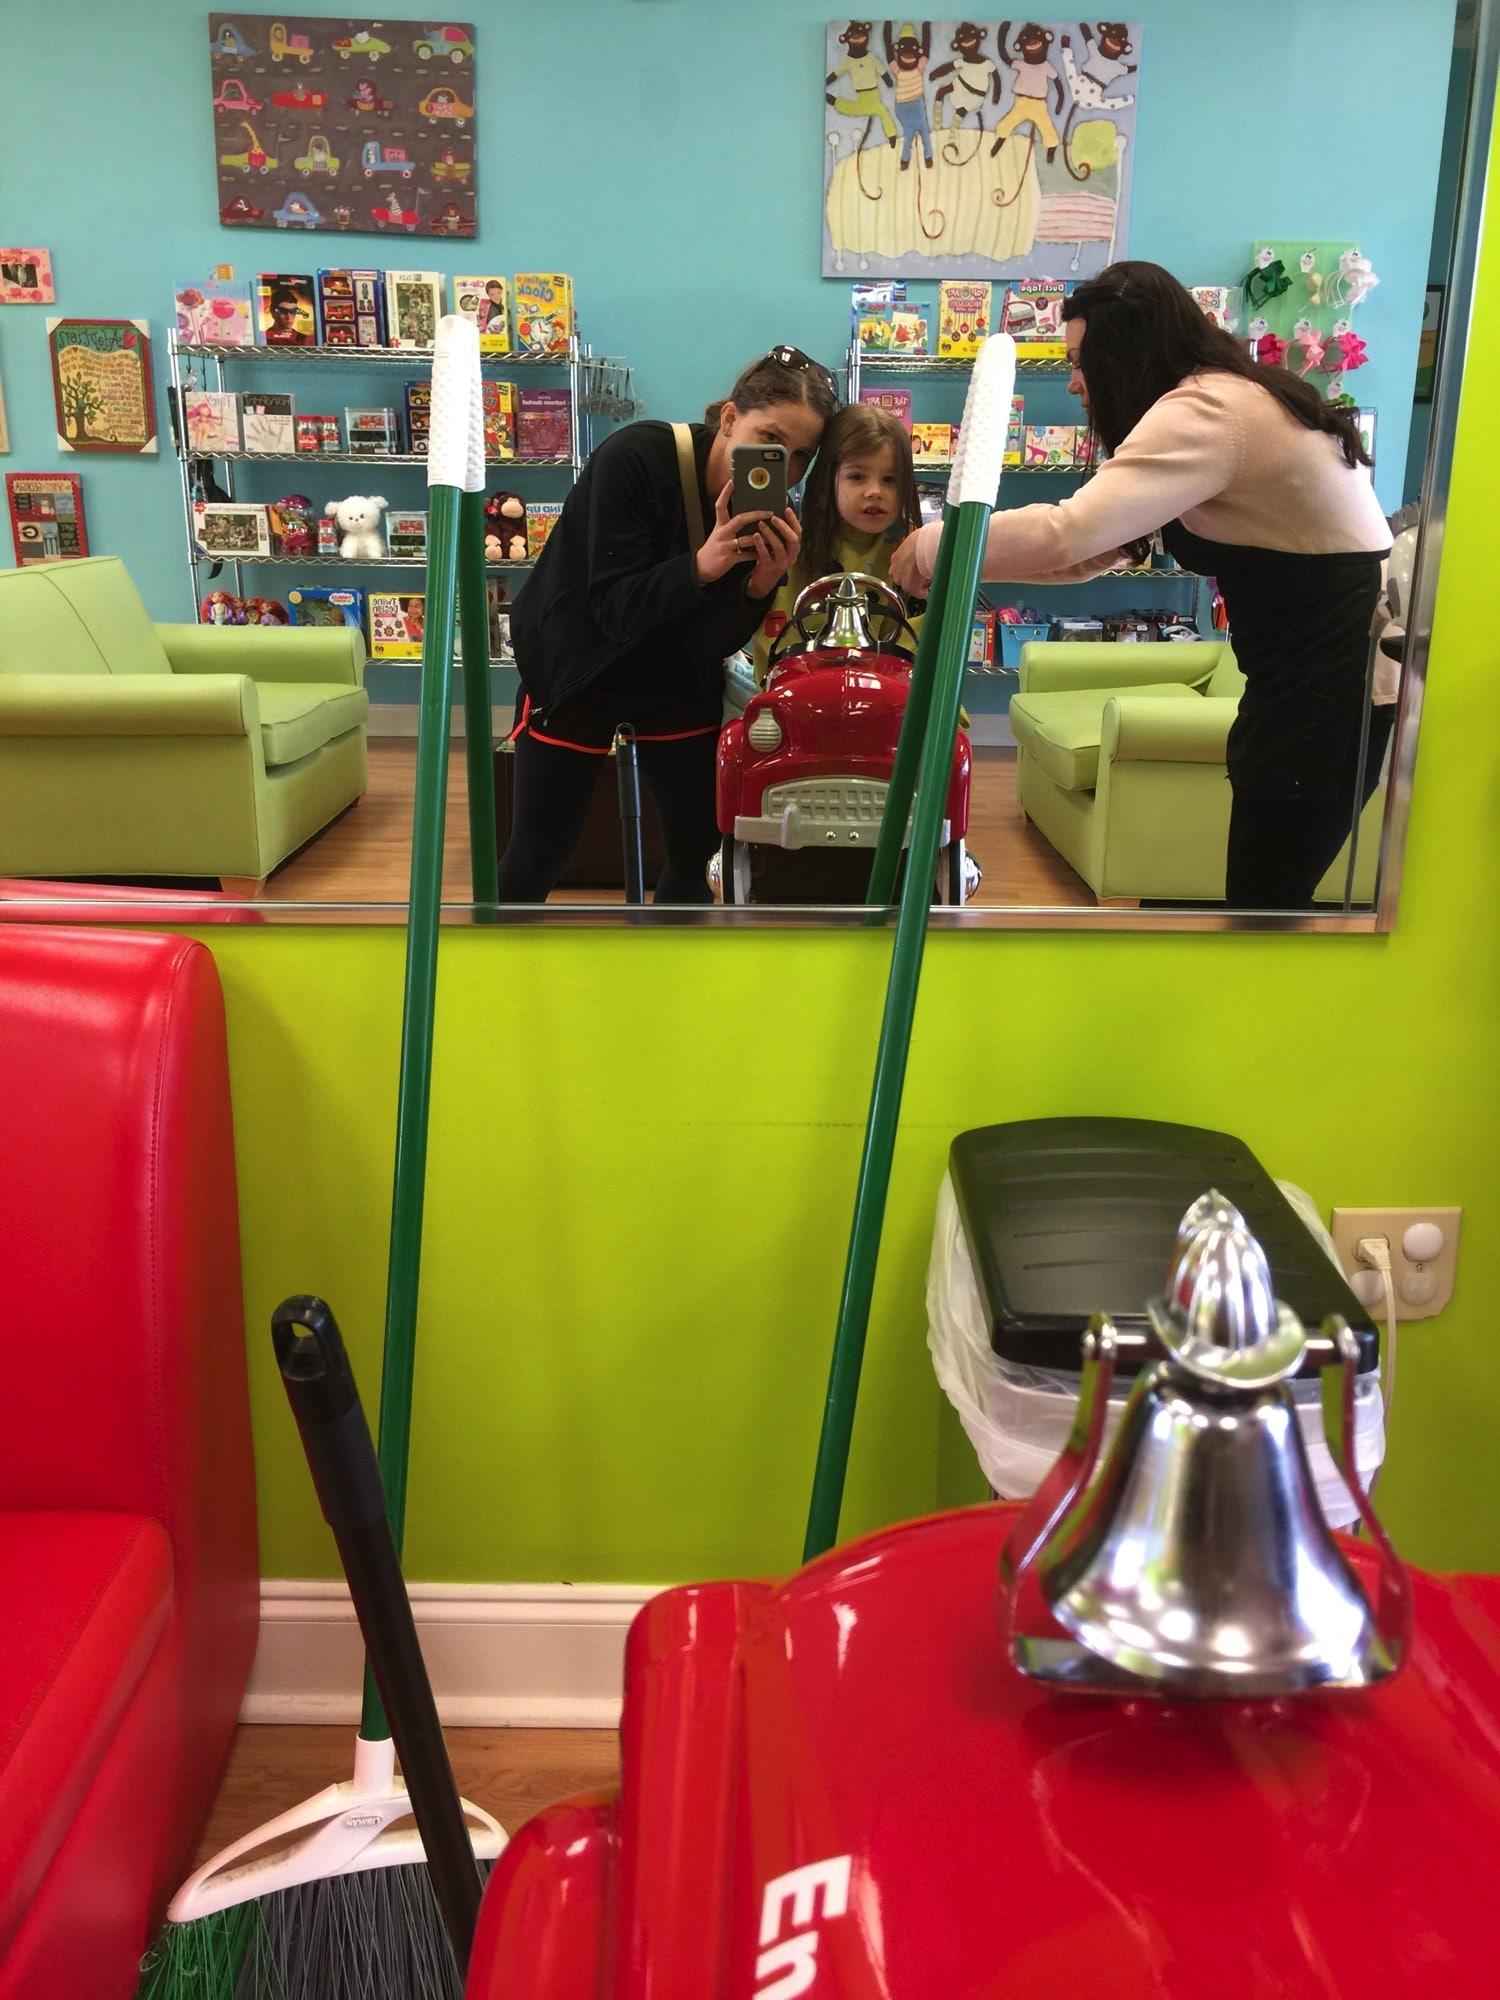 The haircut donation